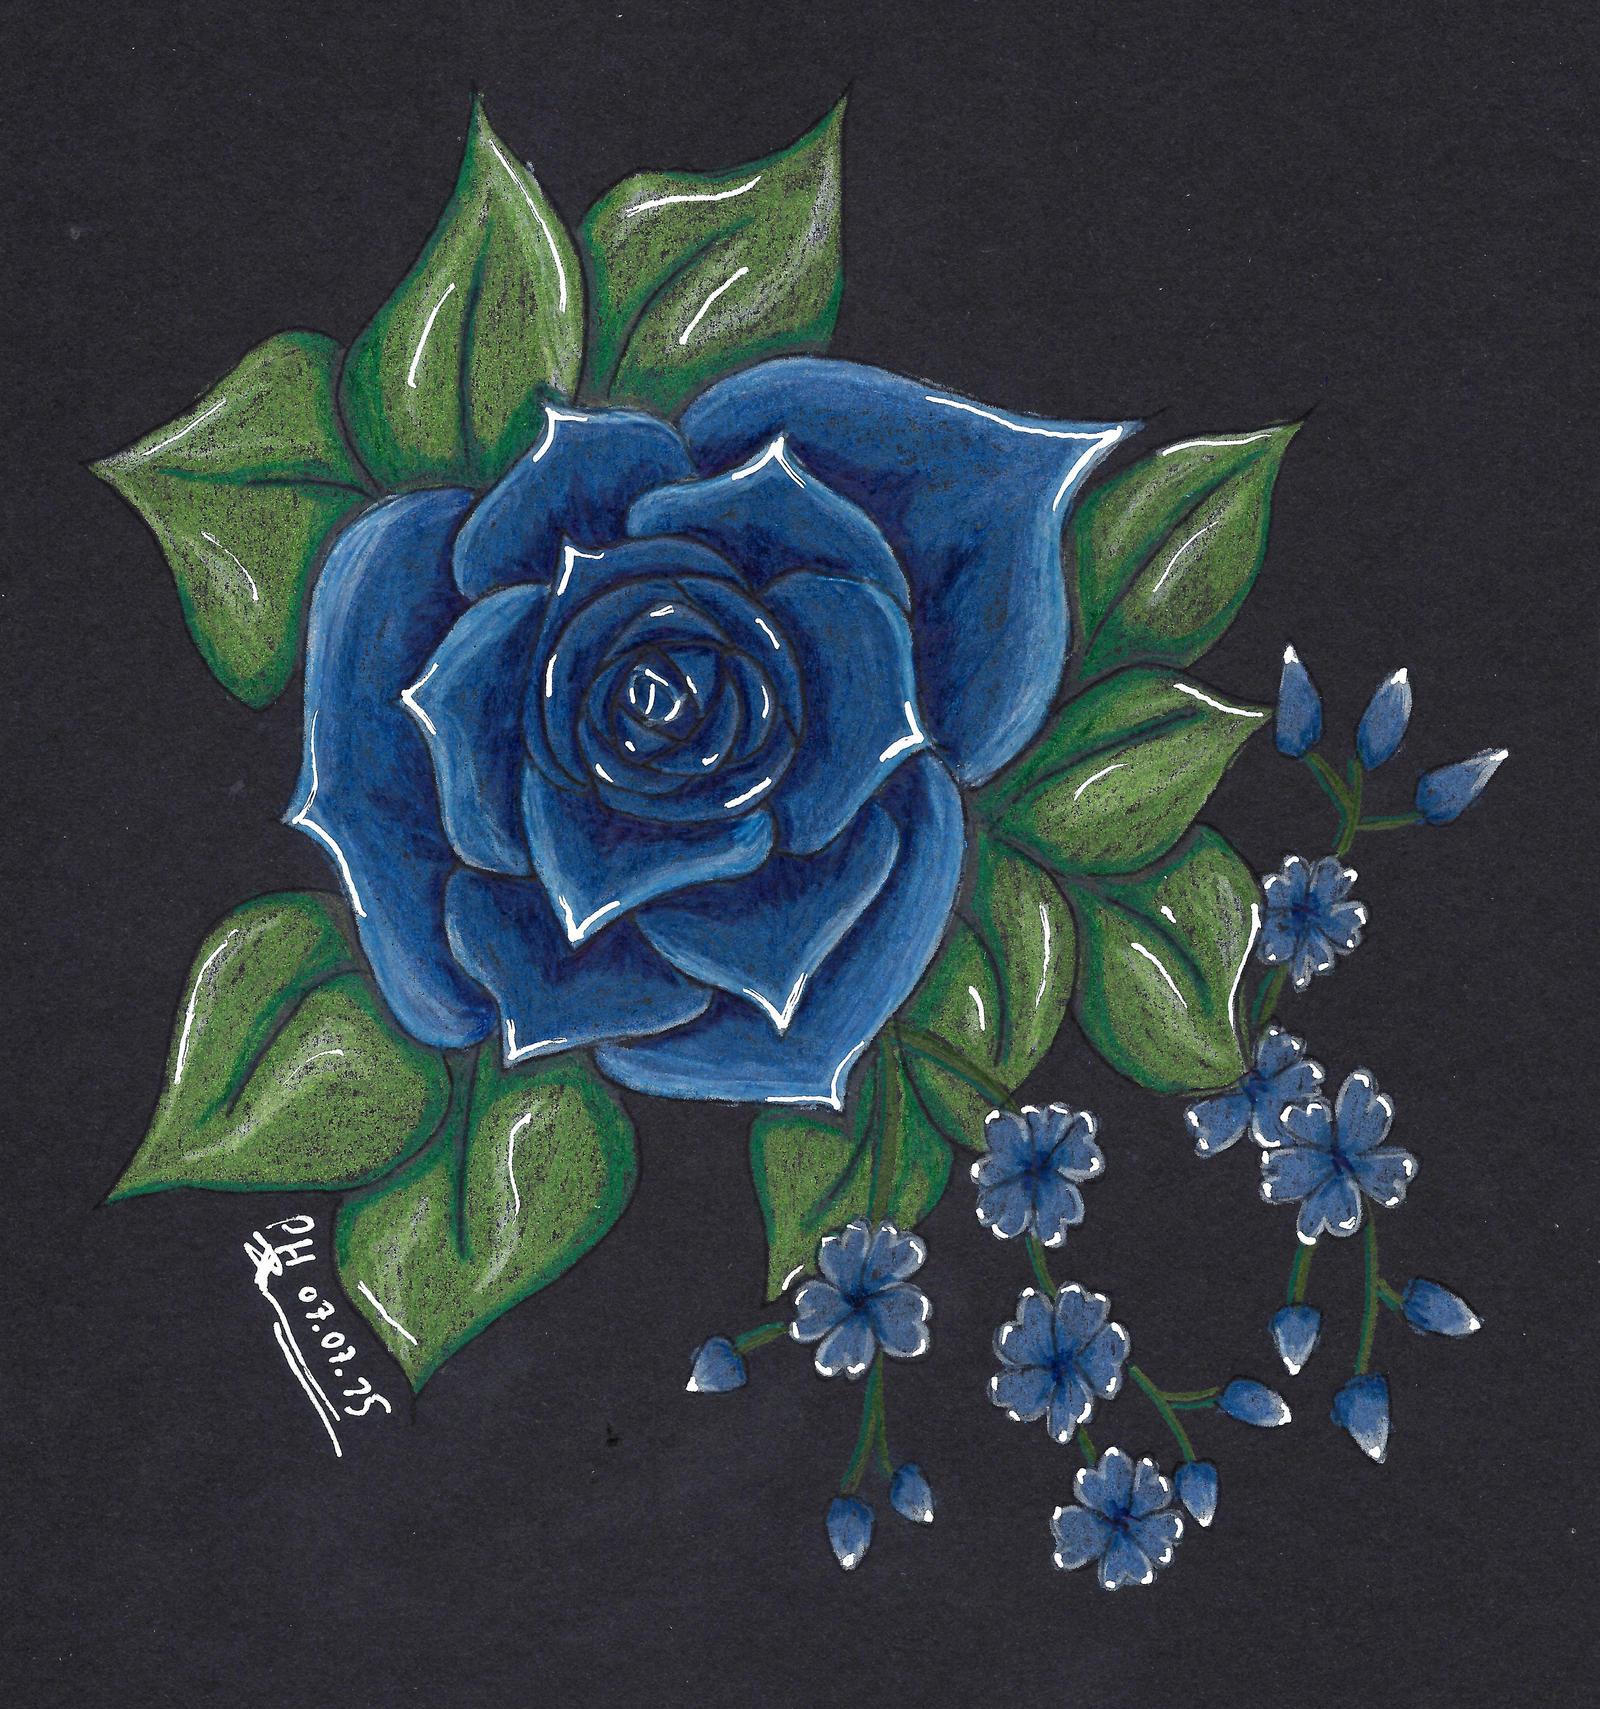 Blume by PanHaukatze